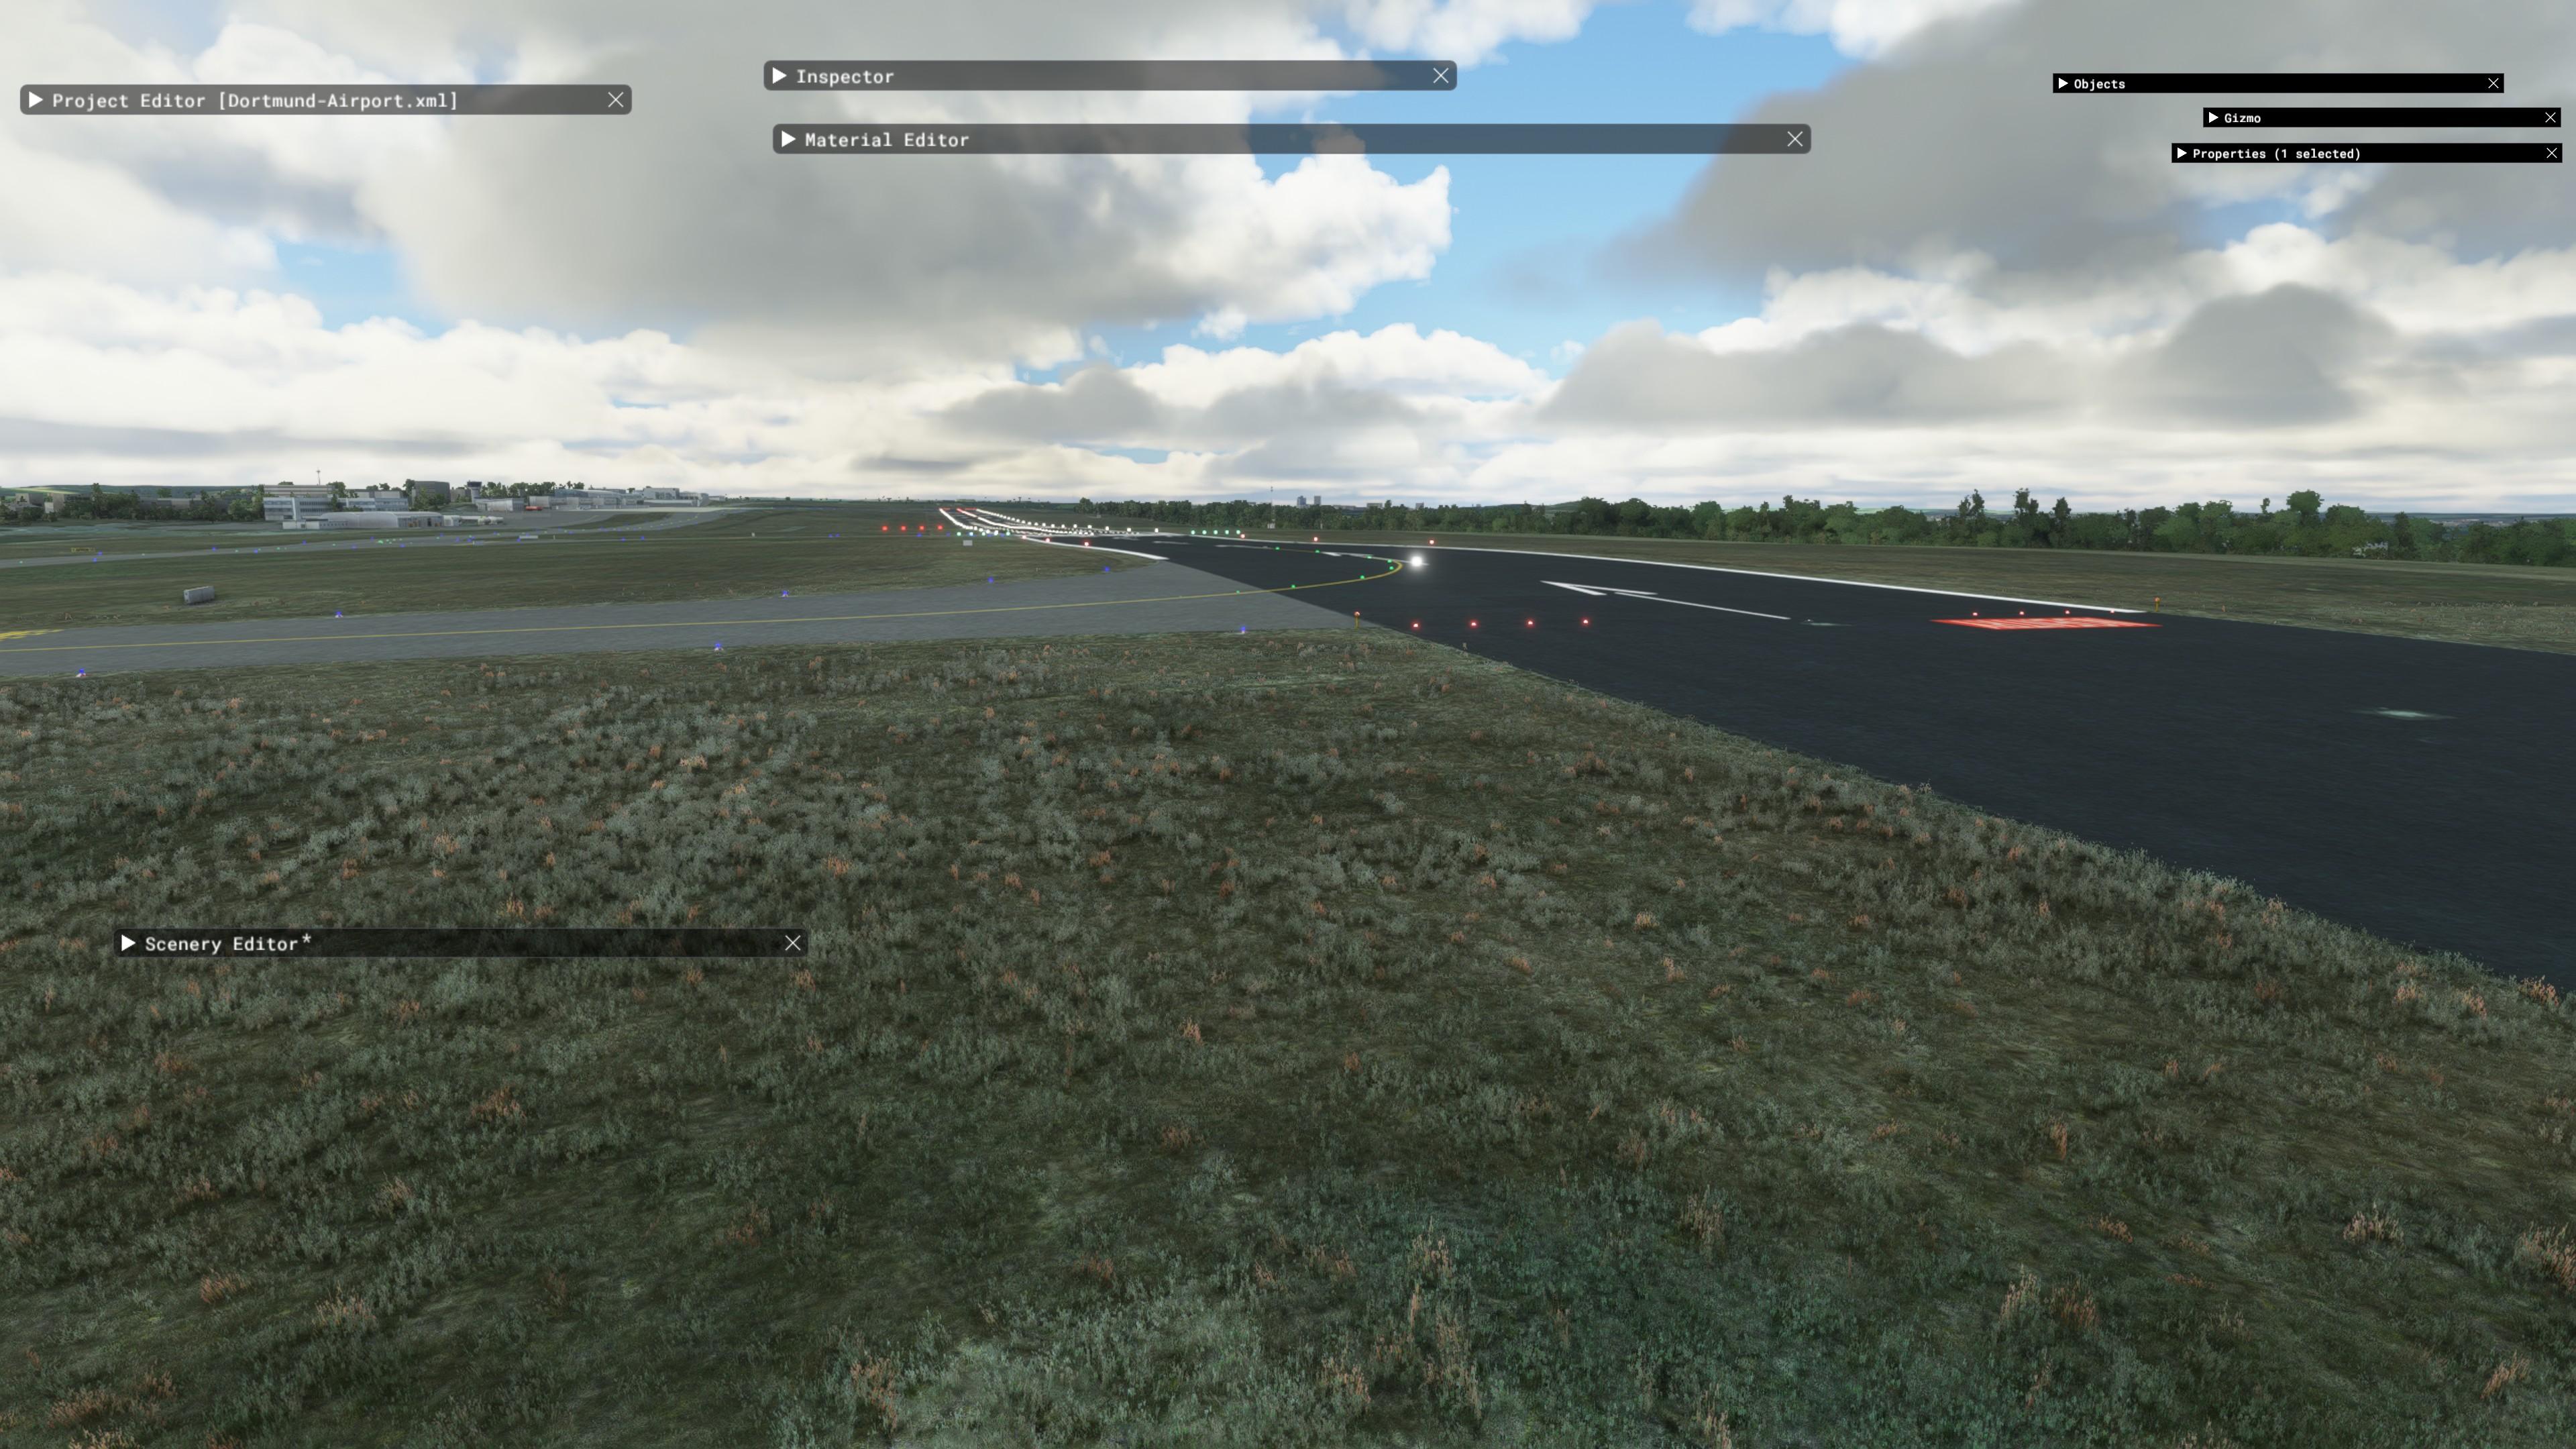 mfs_lidar_adata_edlw_airport_2.jpg